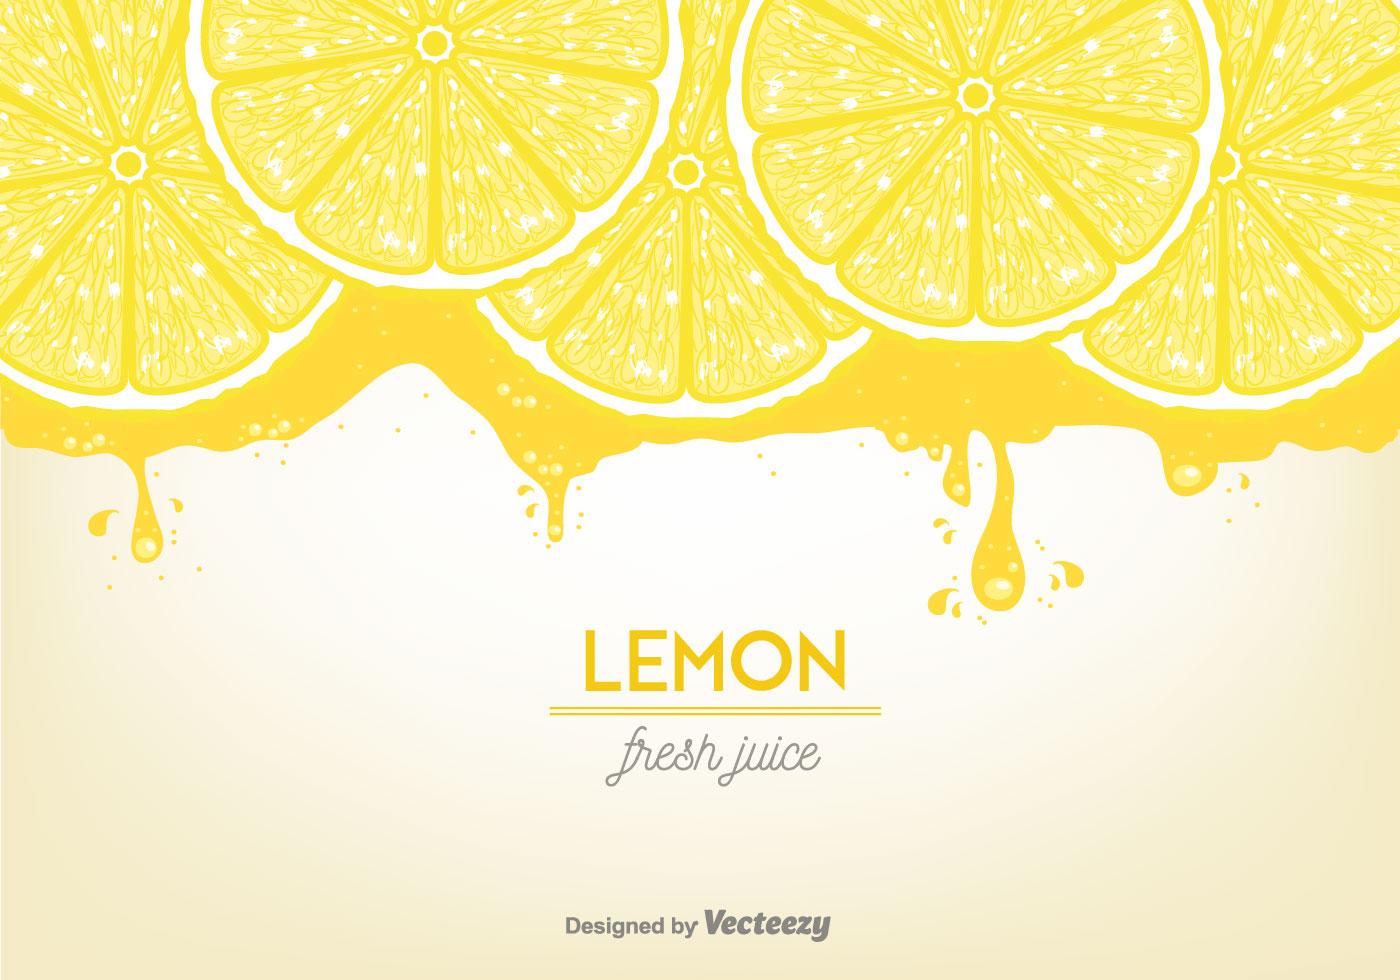 lemon vector free download - photo #32